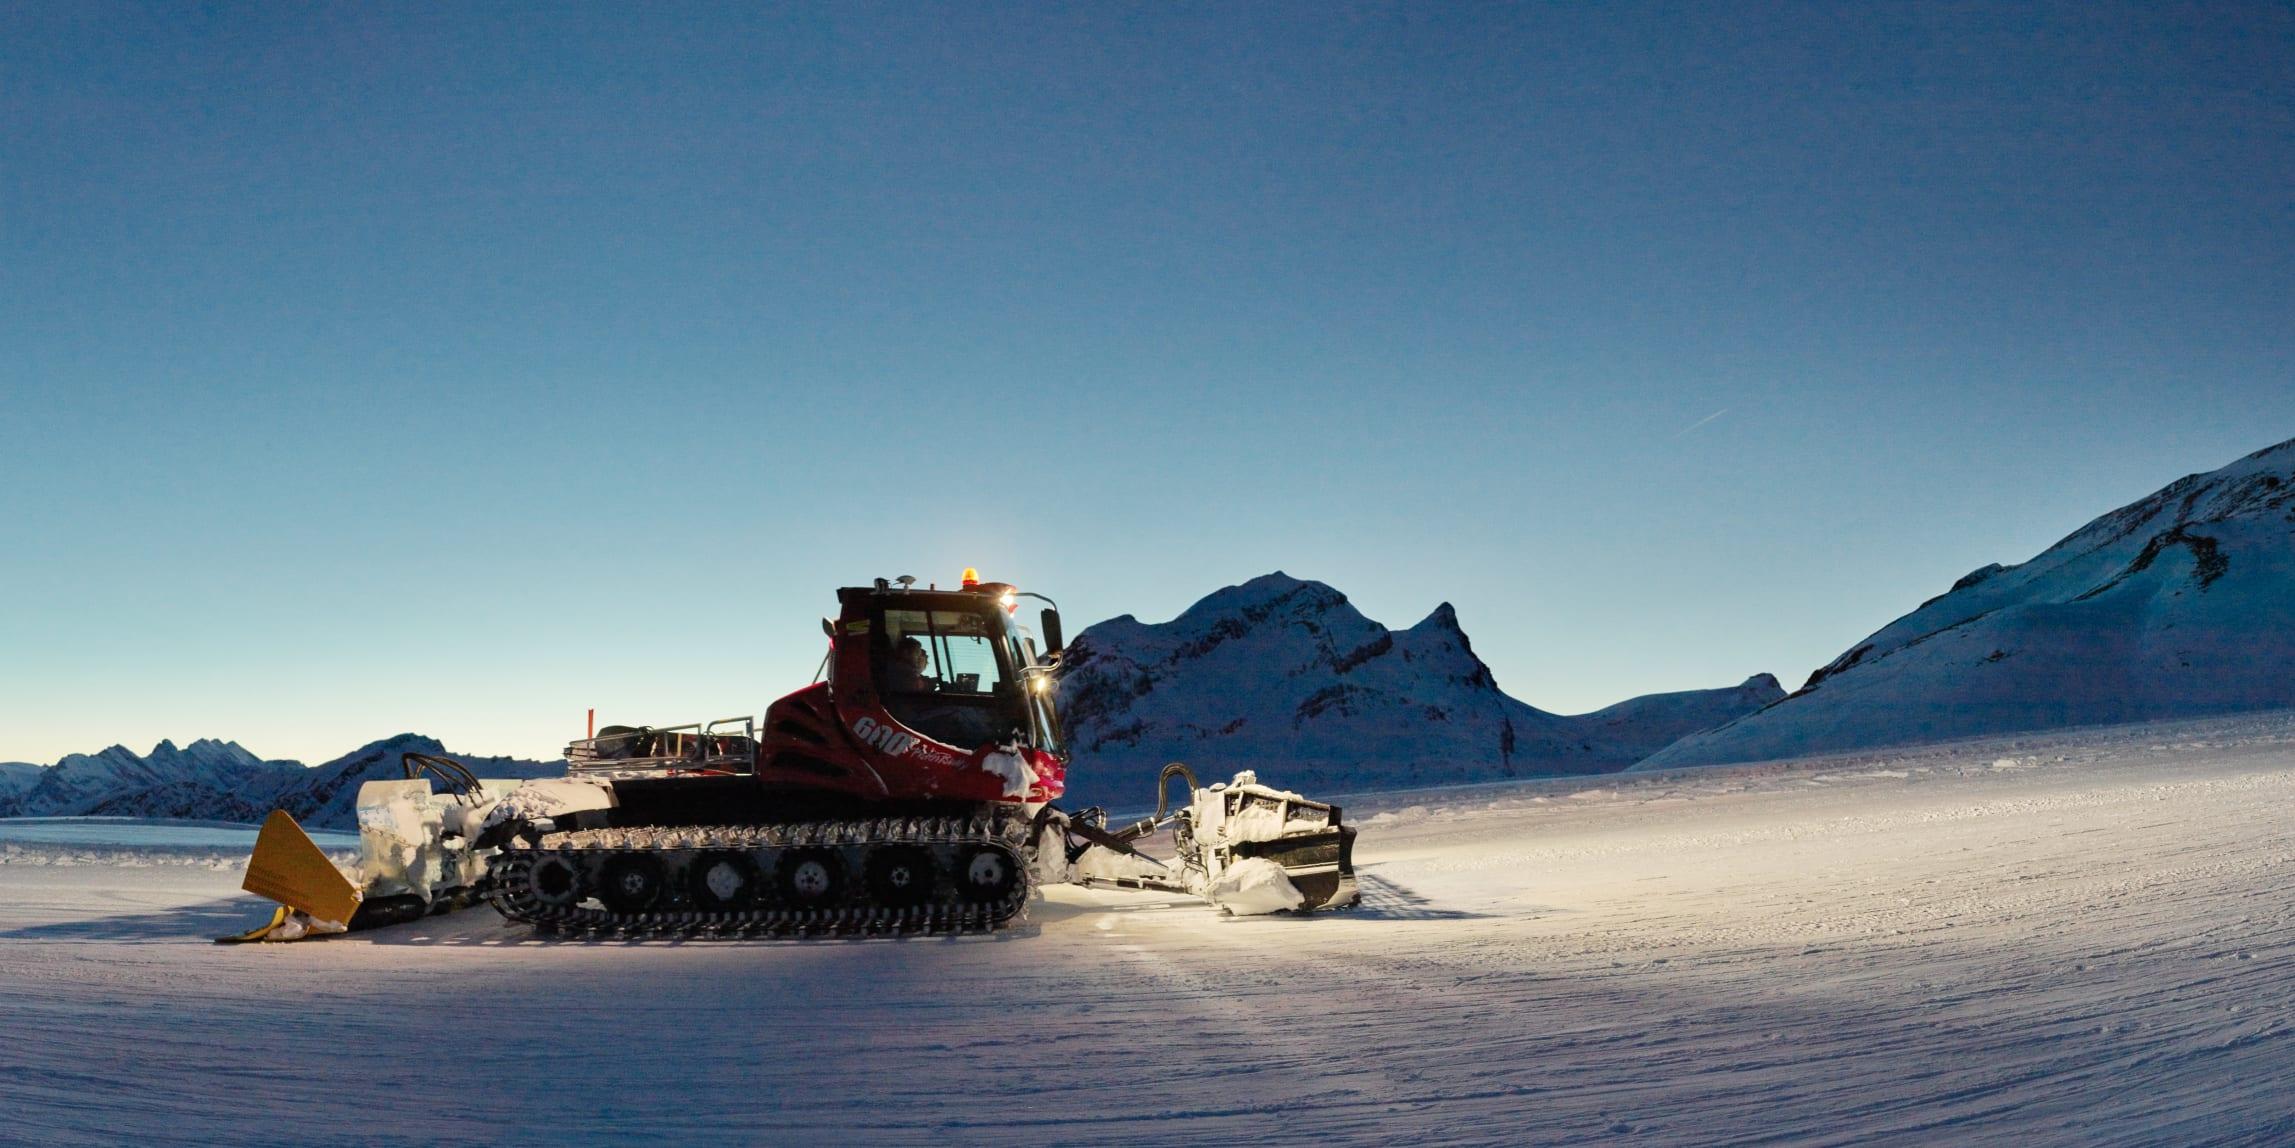 Bahnen-Maschinen, Erlebnisse-Aktivitaeten, Jungfrau-Ski-Region, Pistenbully, Pistenbullyfahren, Skigebiet-Grindelwald-First, Skigebiet-Grindelwald-Wengen, Winter